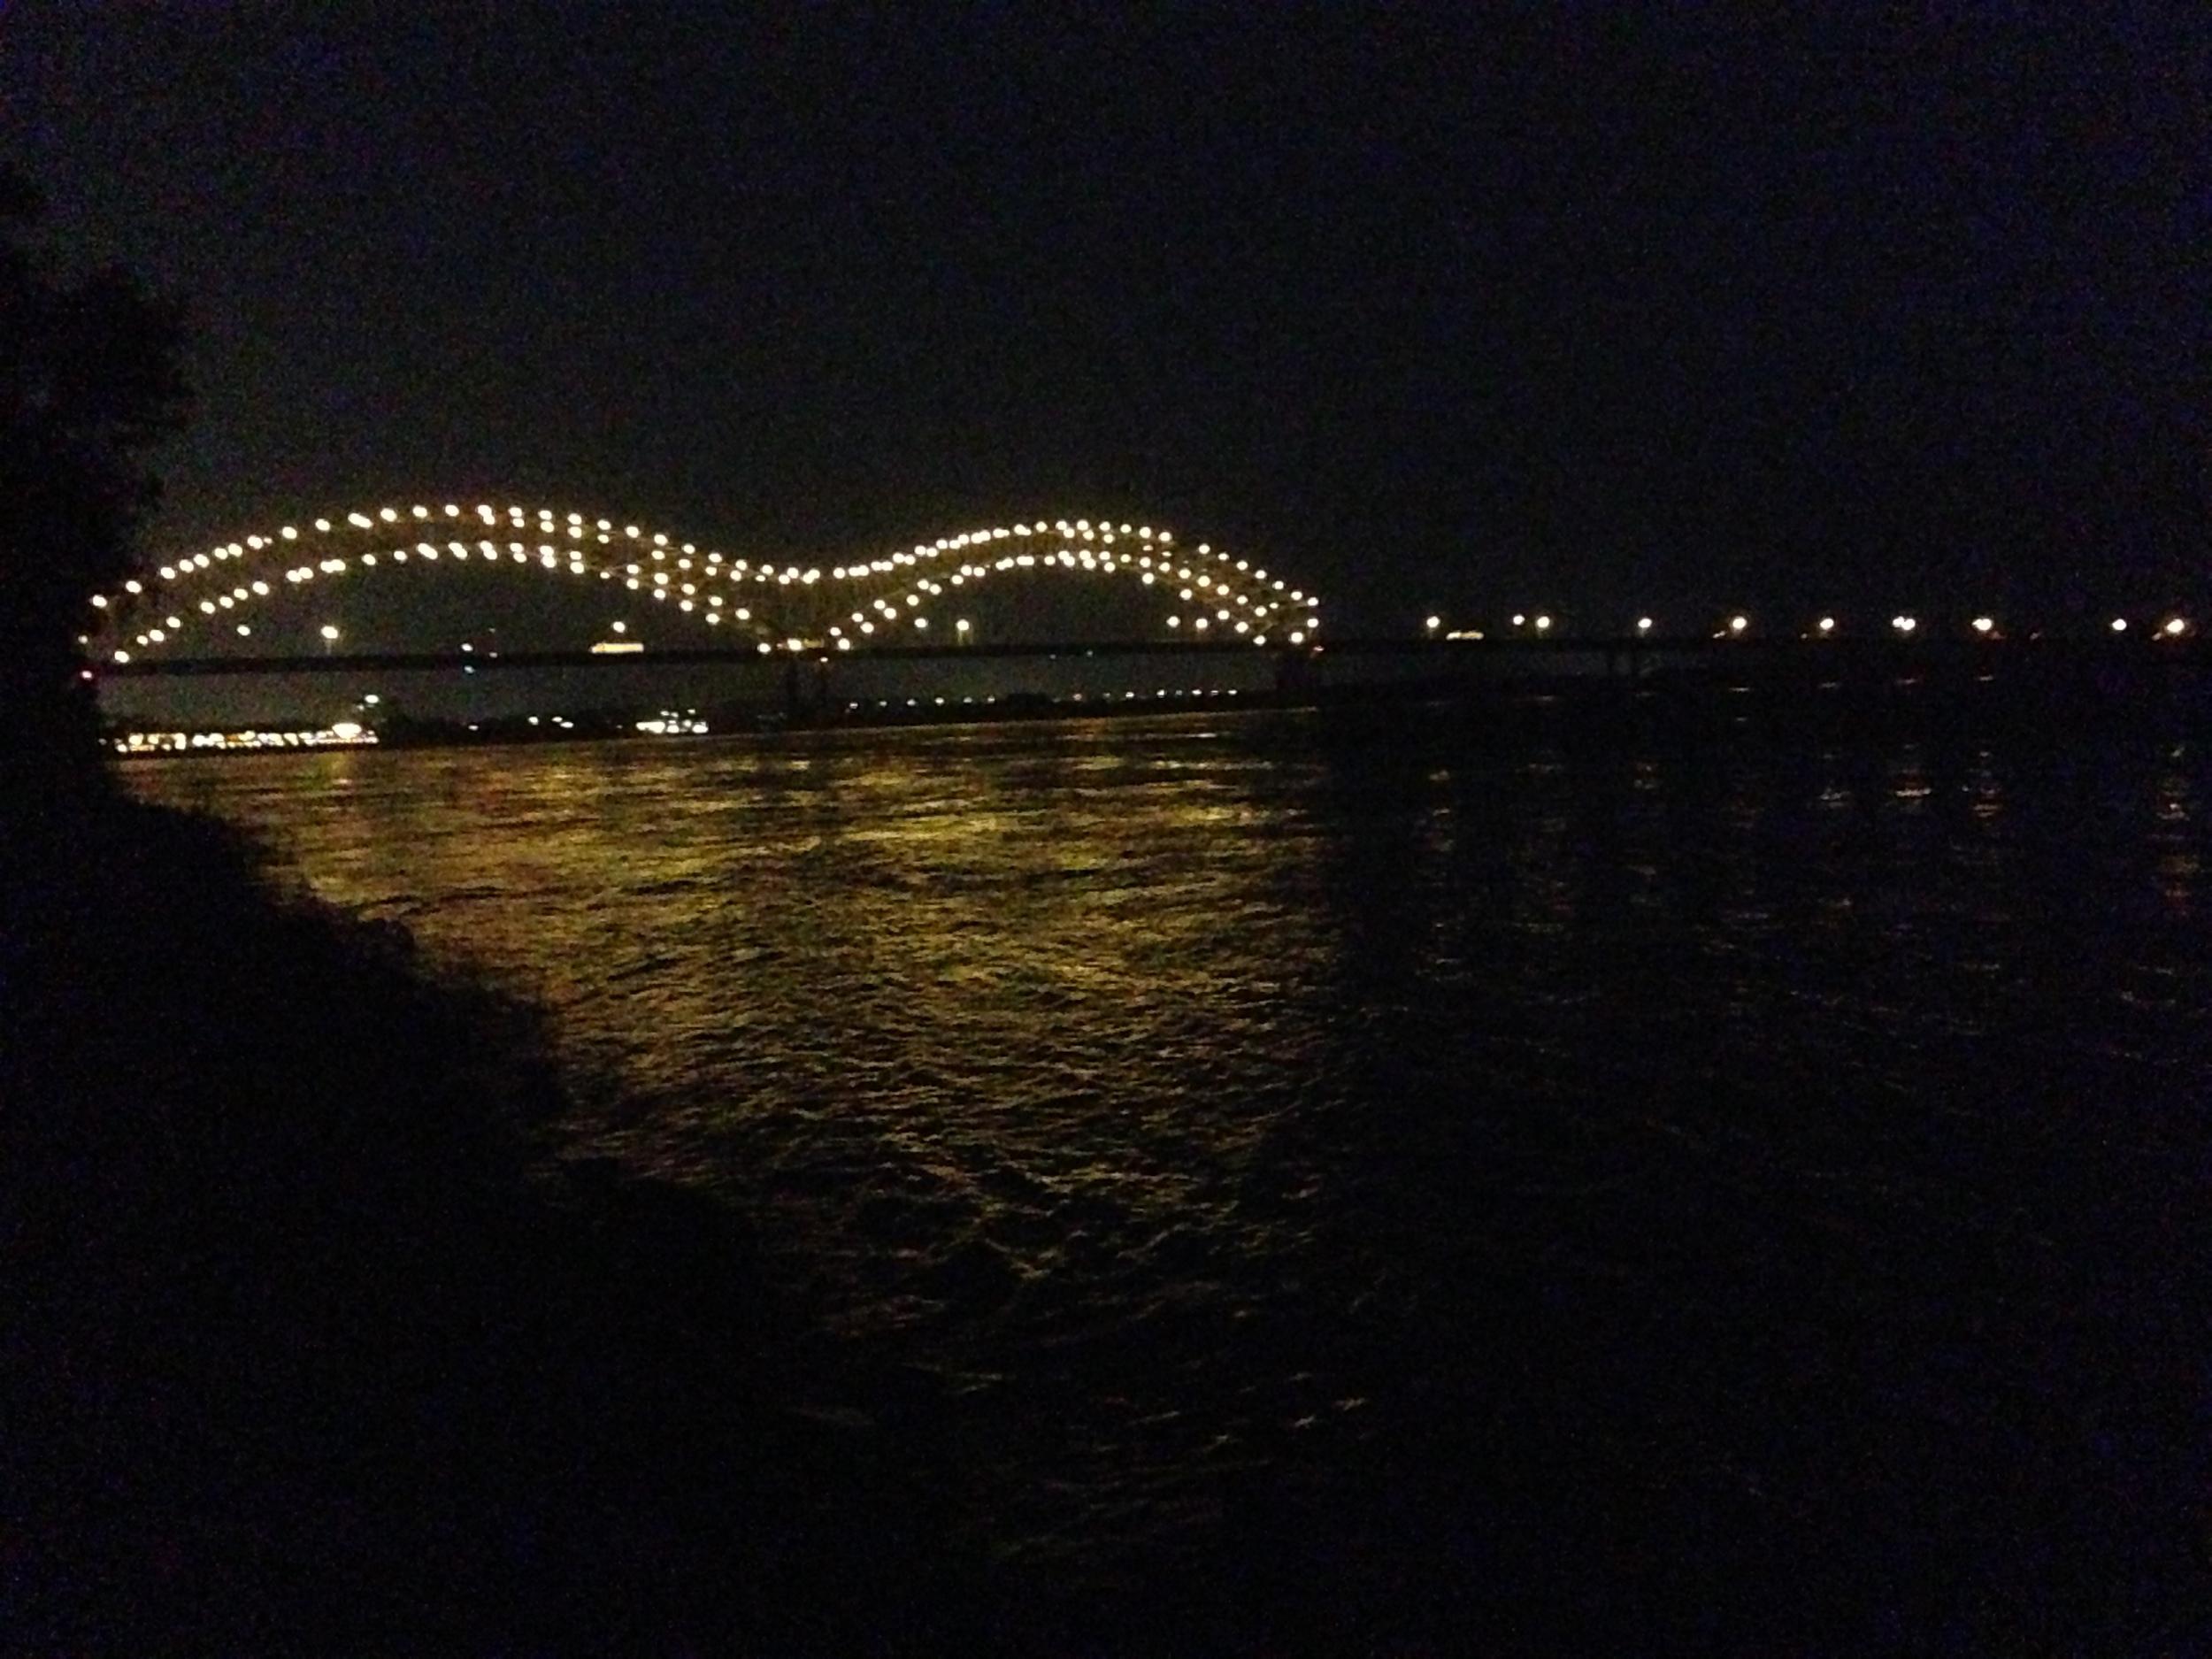 Mississippi River at night.